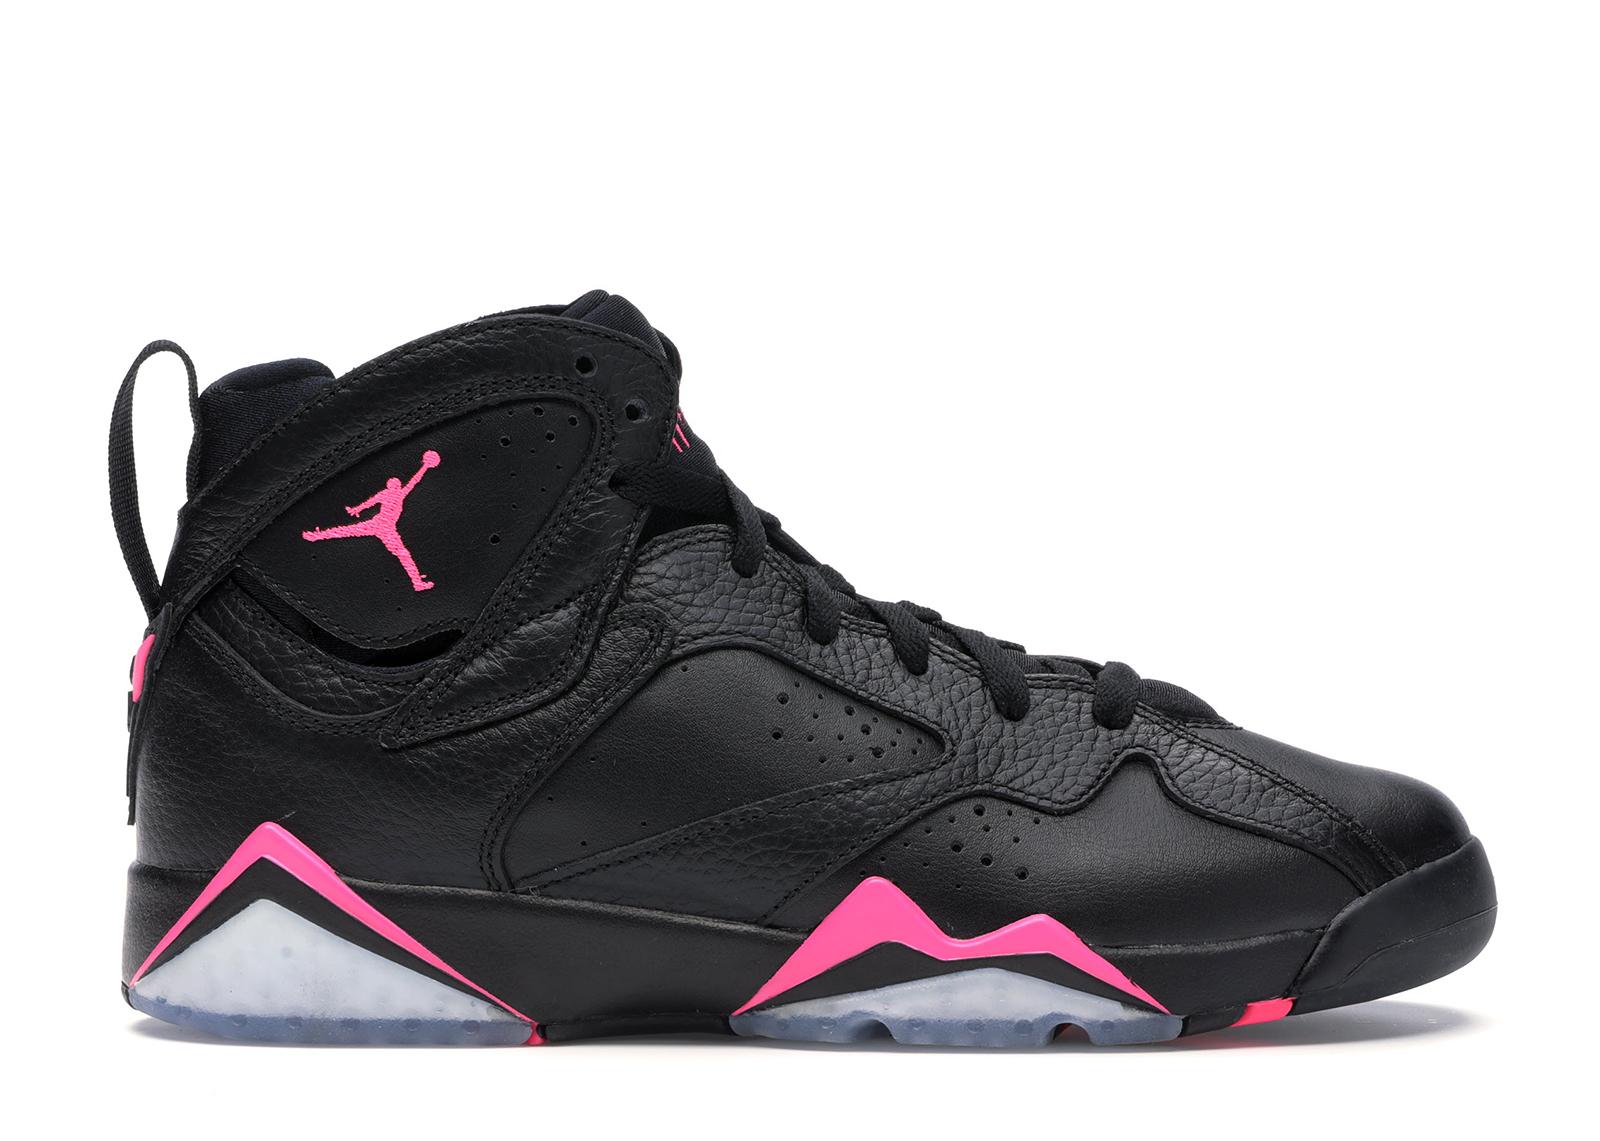 Jordan 7 Retro Black Hyper Pink (GS